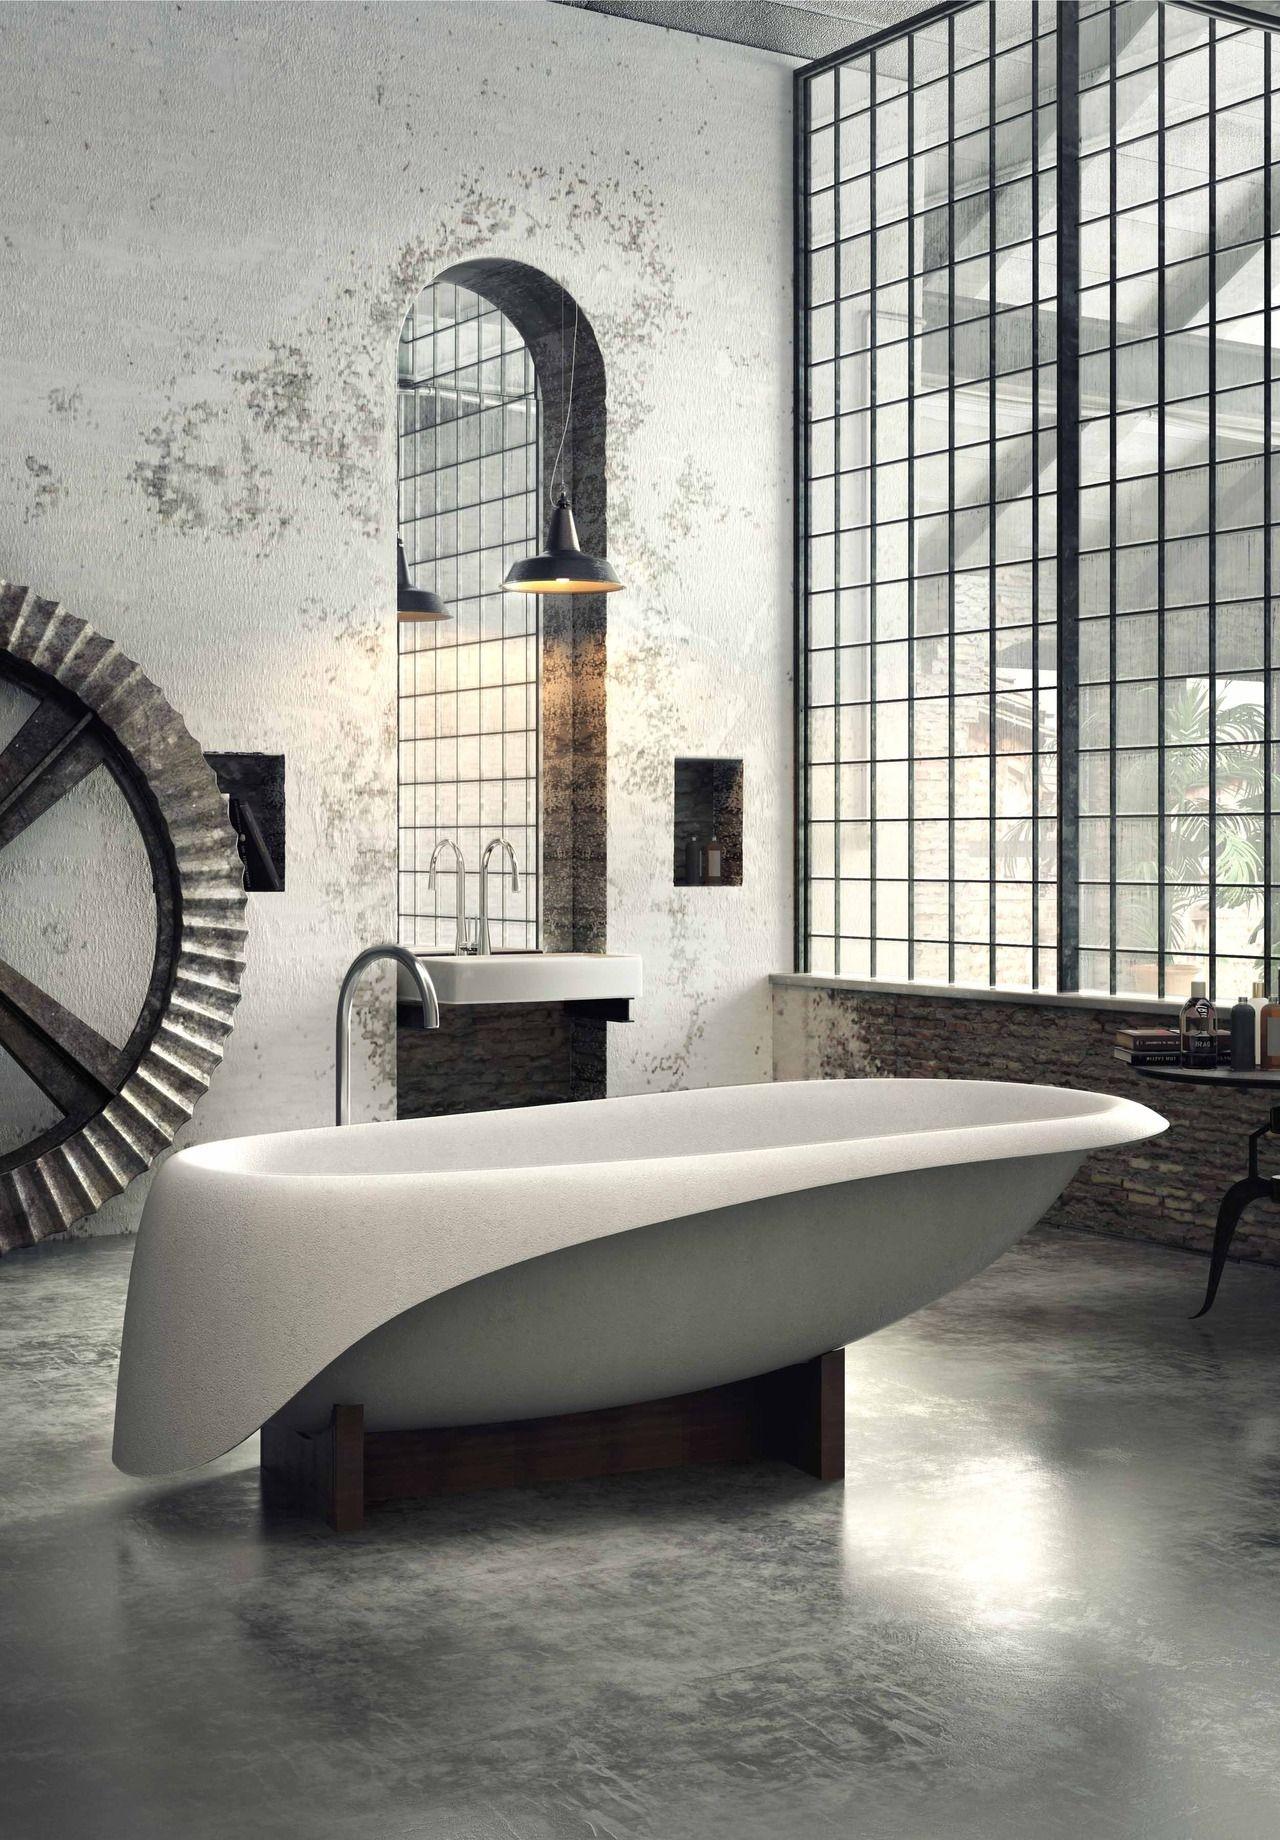 30 Inspiring Industrial Bathroom Ideas | Industrial style ...